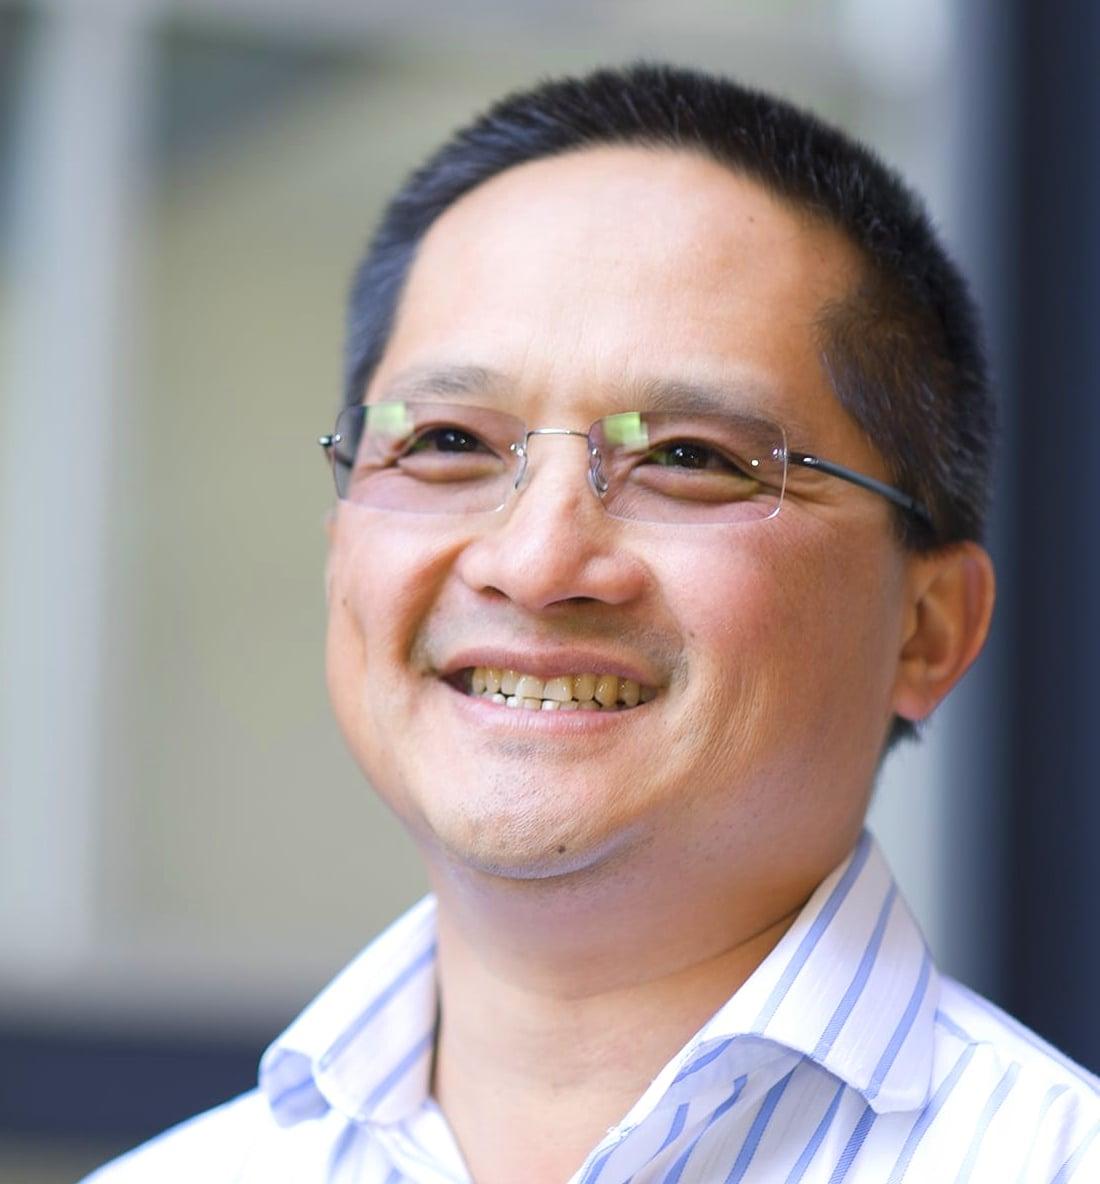 Co-founder and CTO, Tony Nguyen